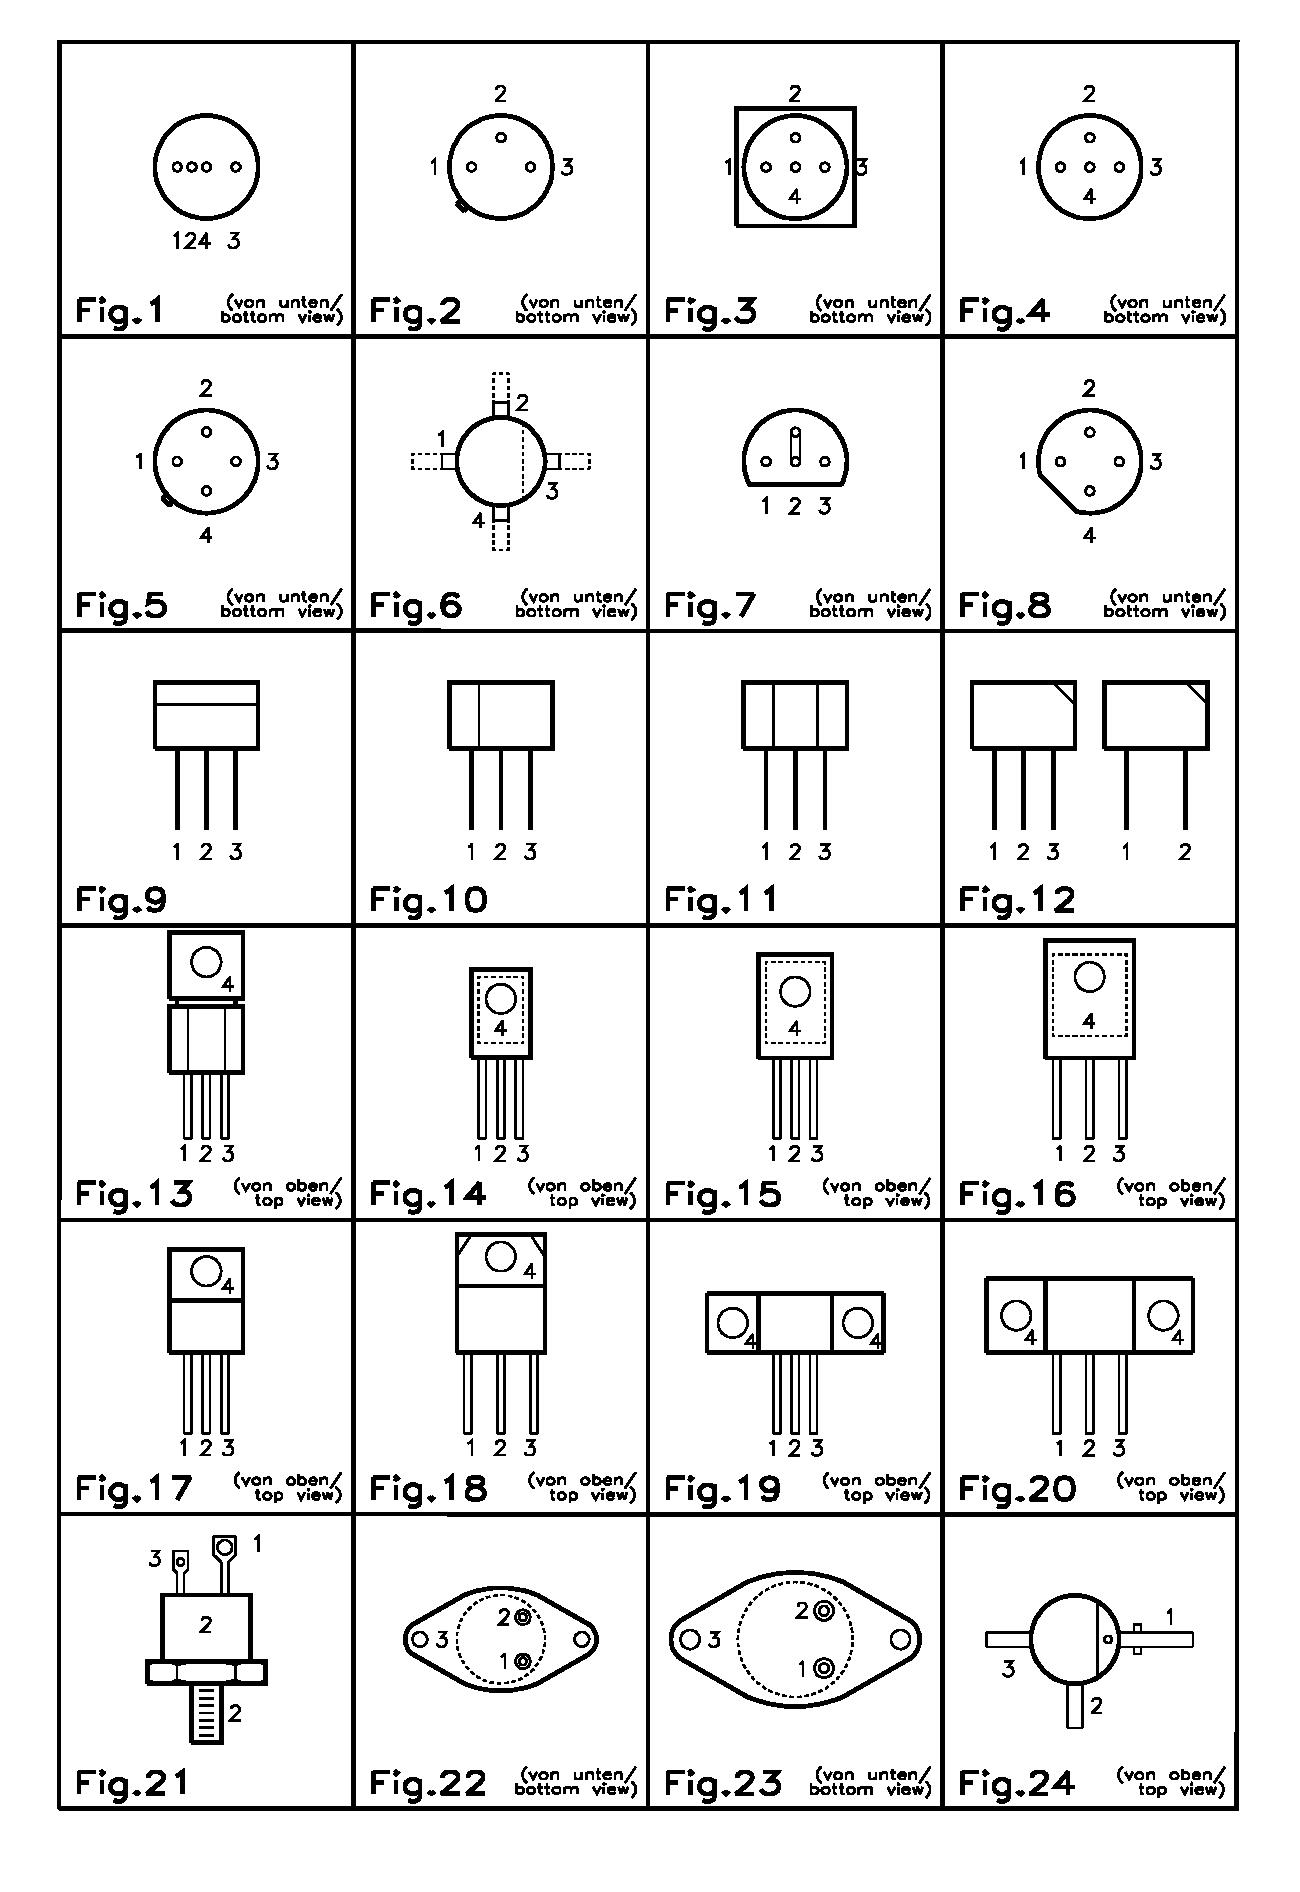 Vrt Comparsion Table For Semiconductors Eca Online Shop Design Circuits Vergleichstabellen Transistoren Cross Reference